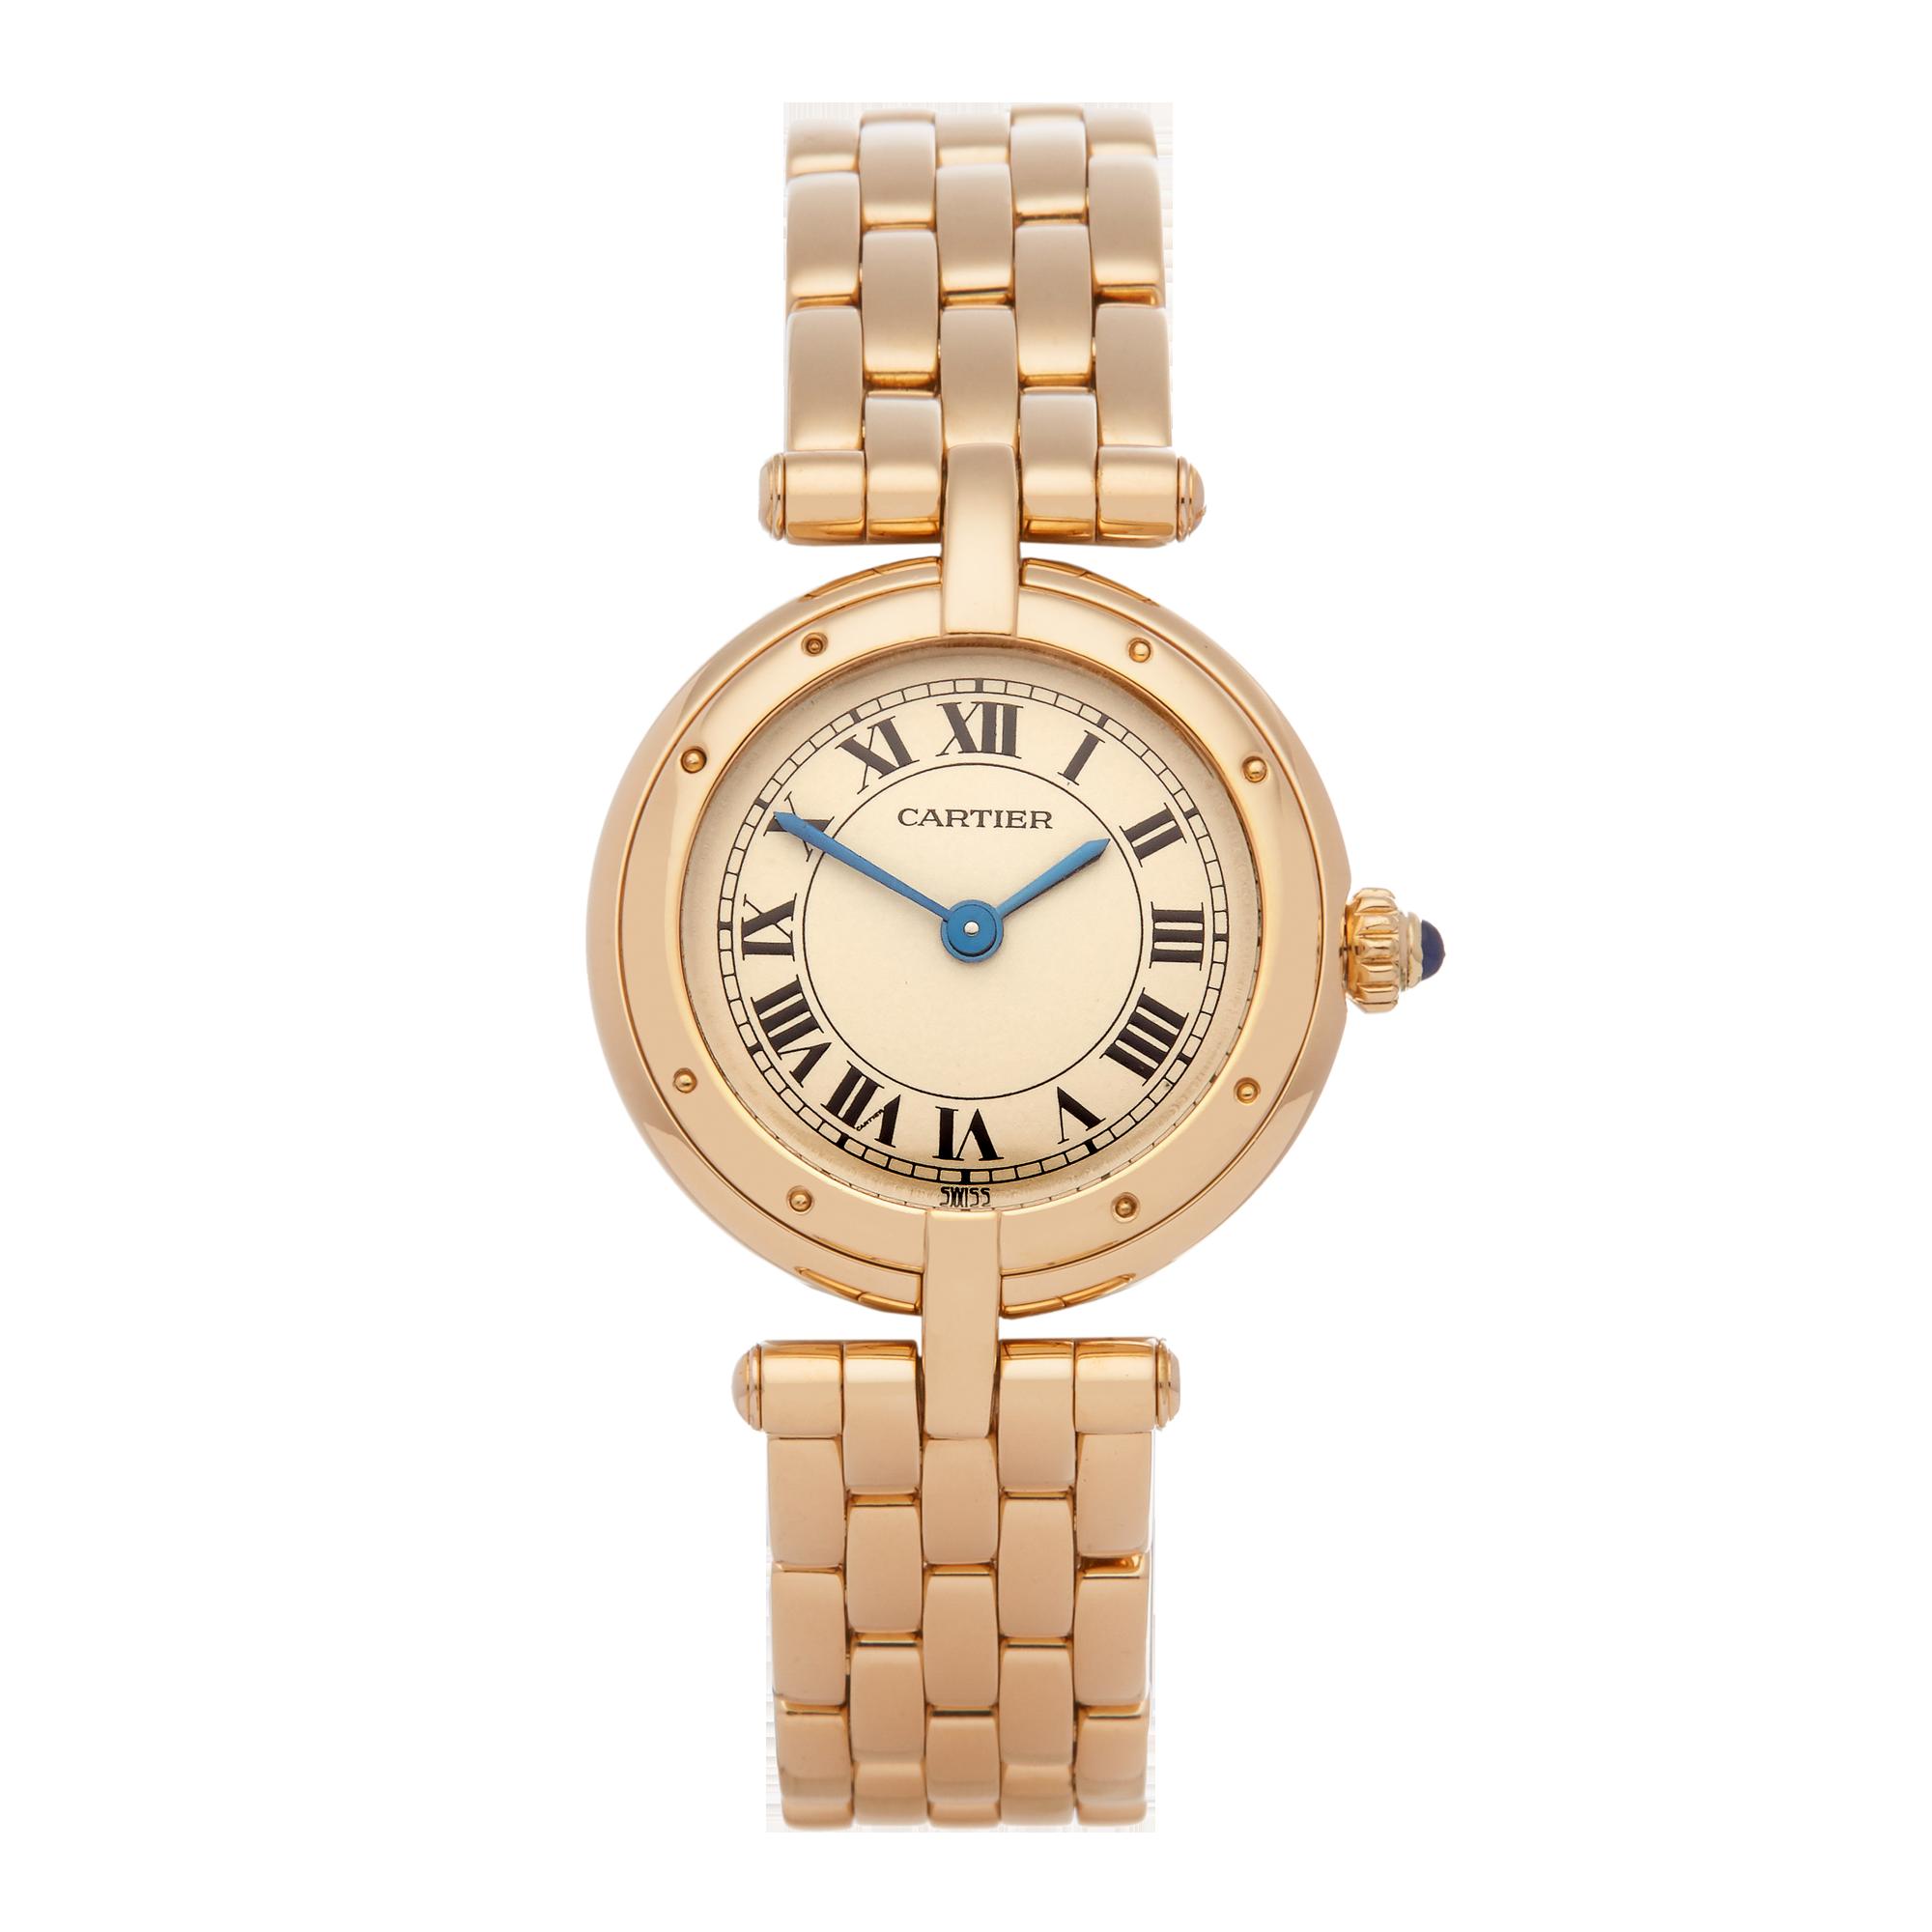 Cartier Panthère Vendome Ladies Yellow Gold Watch